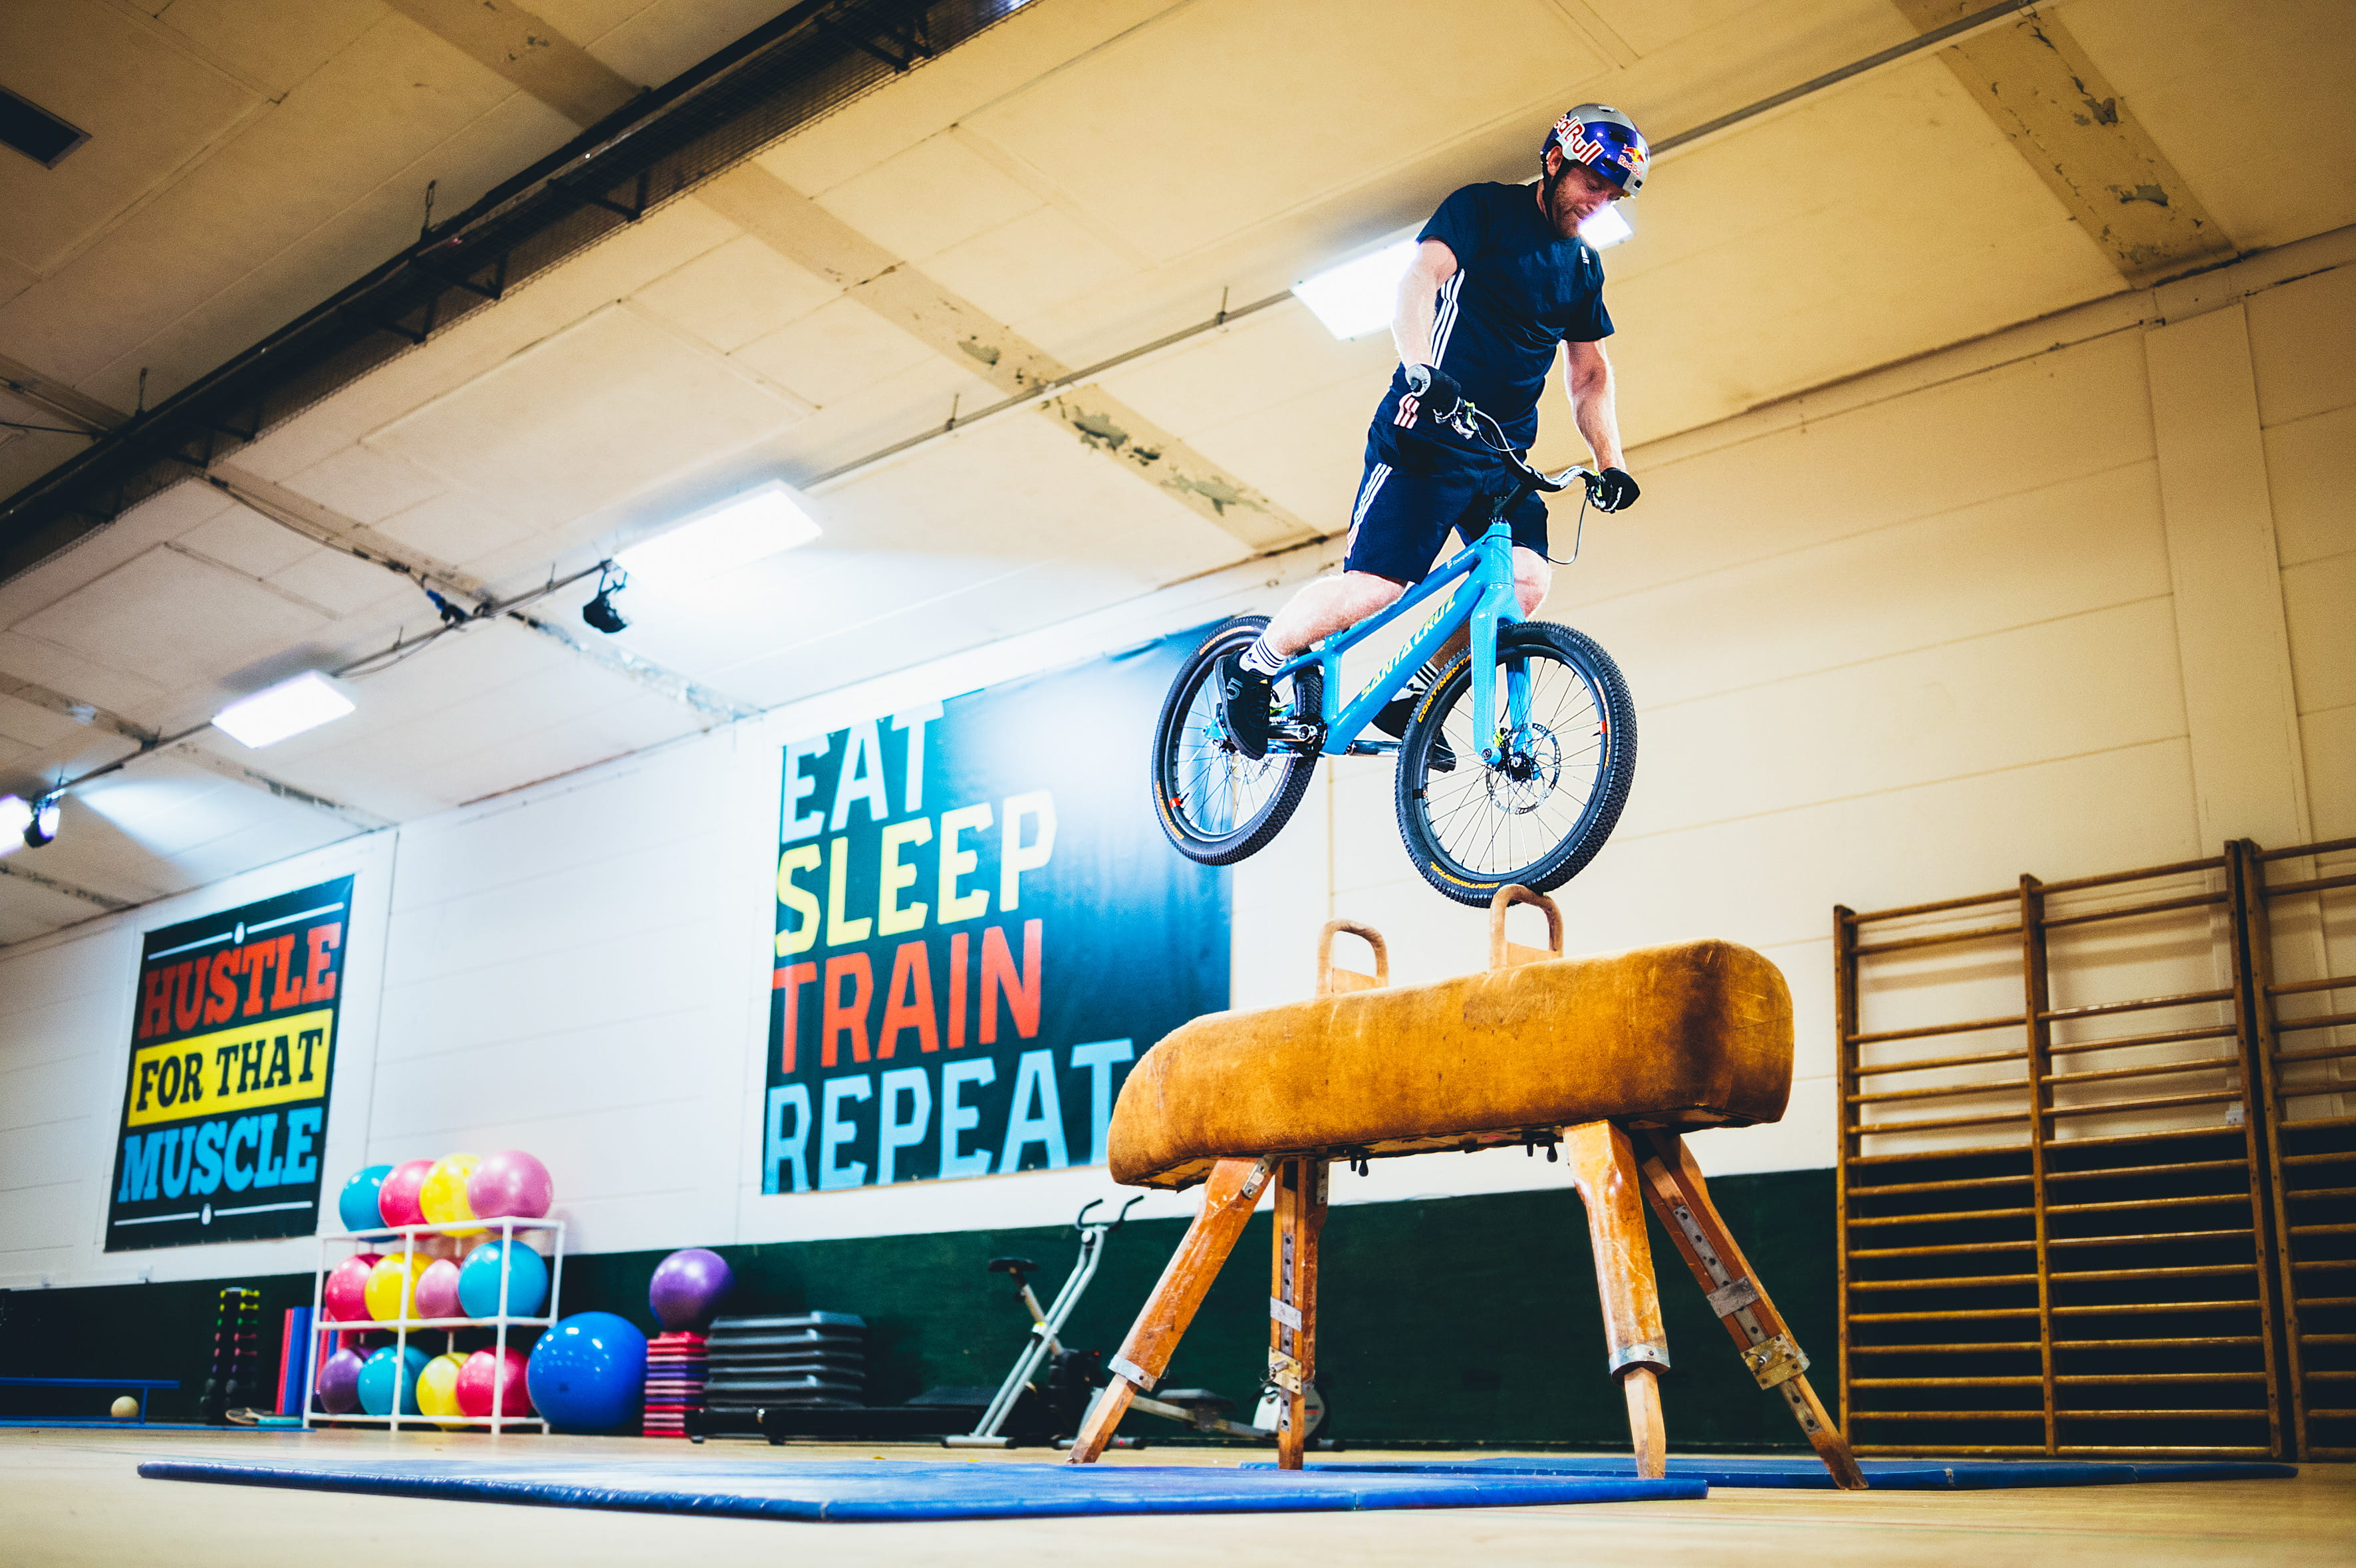 Danny-MacAskill_Gymnasium_-c-_RedBullContentPool_Fred_Murray-20